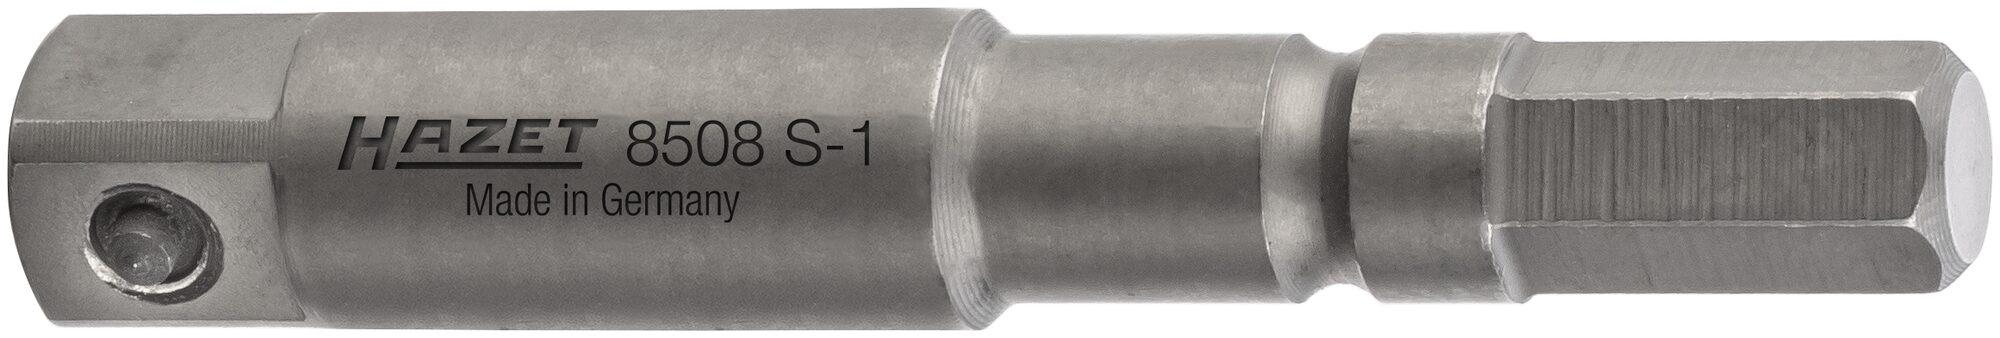 HAZET Schlag- ∙ Maschinenschrauber Adapter 8508S-1 ∙ Sechskant massiv ISO 1173-A 5,5 ∙ Vierkant massiv 6,3 mm (1/4 Zoll)